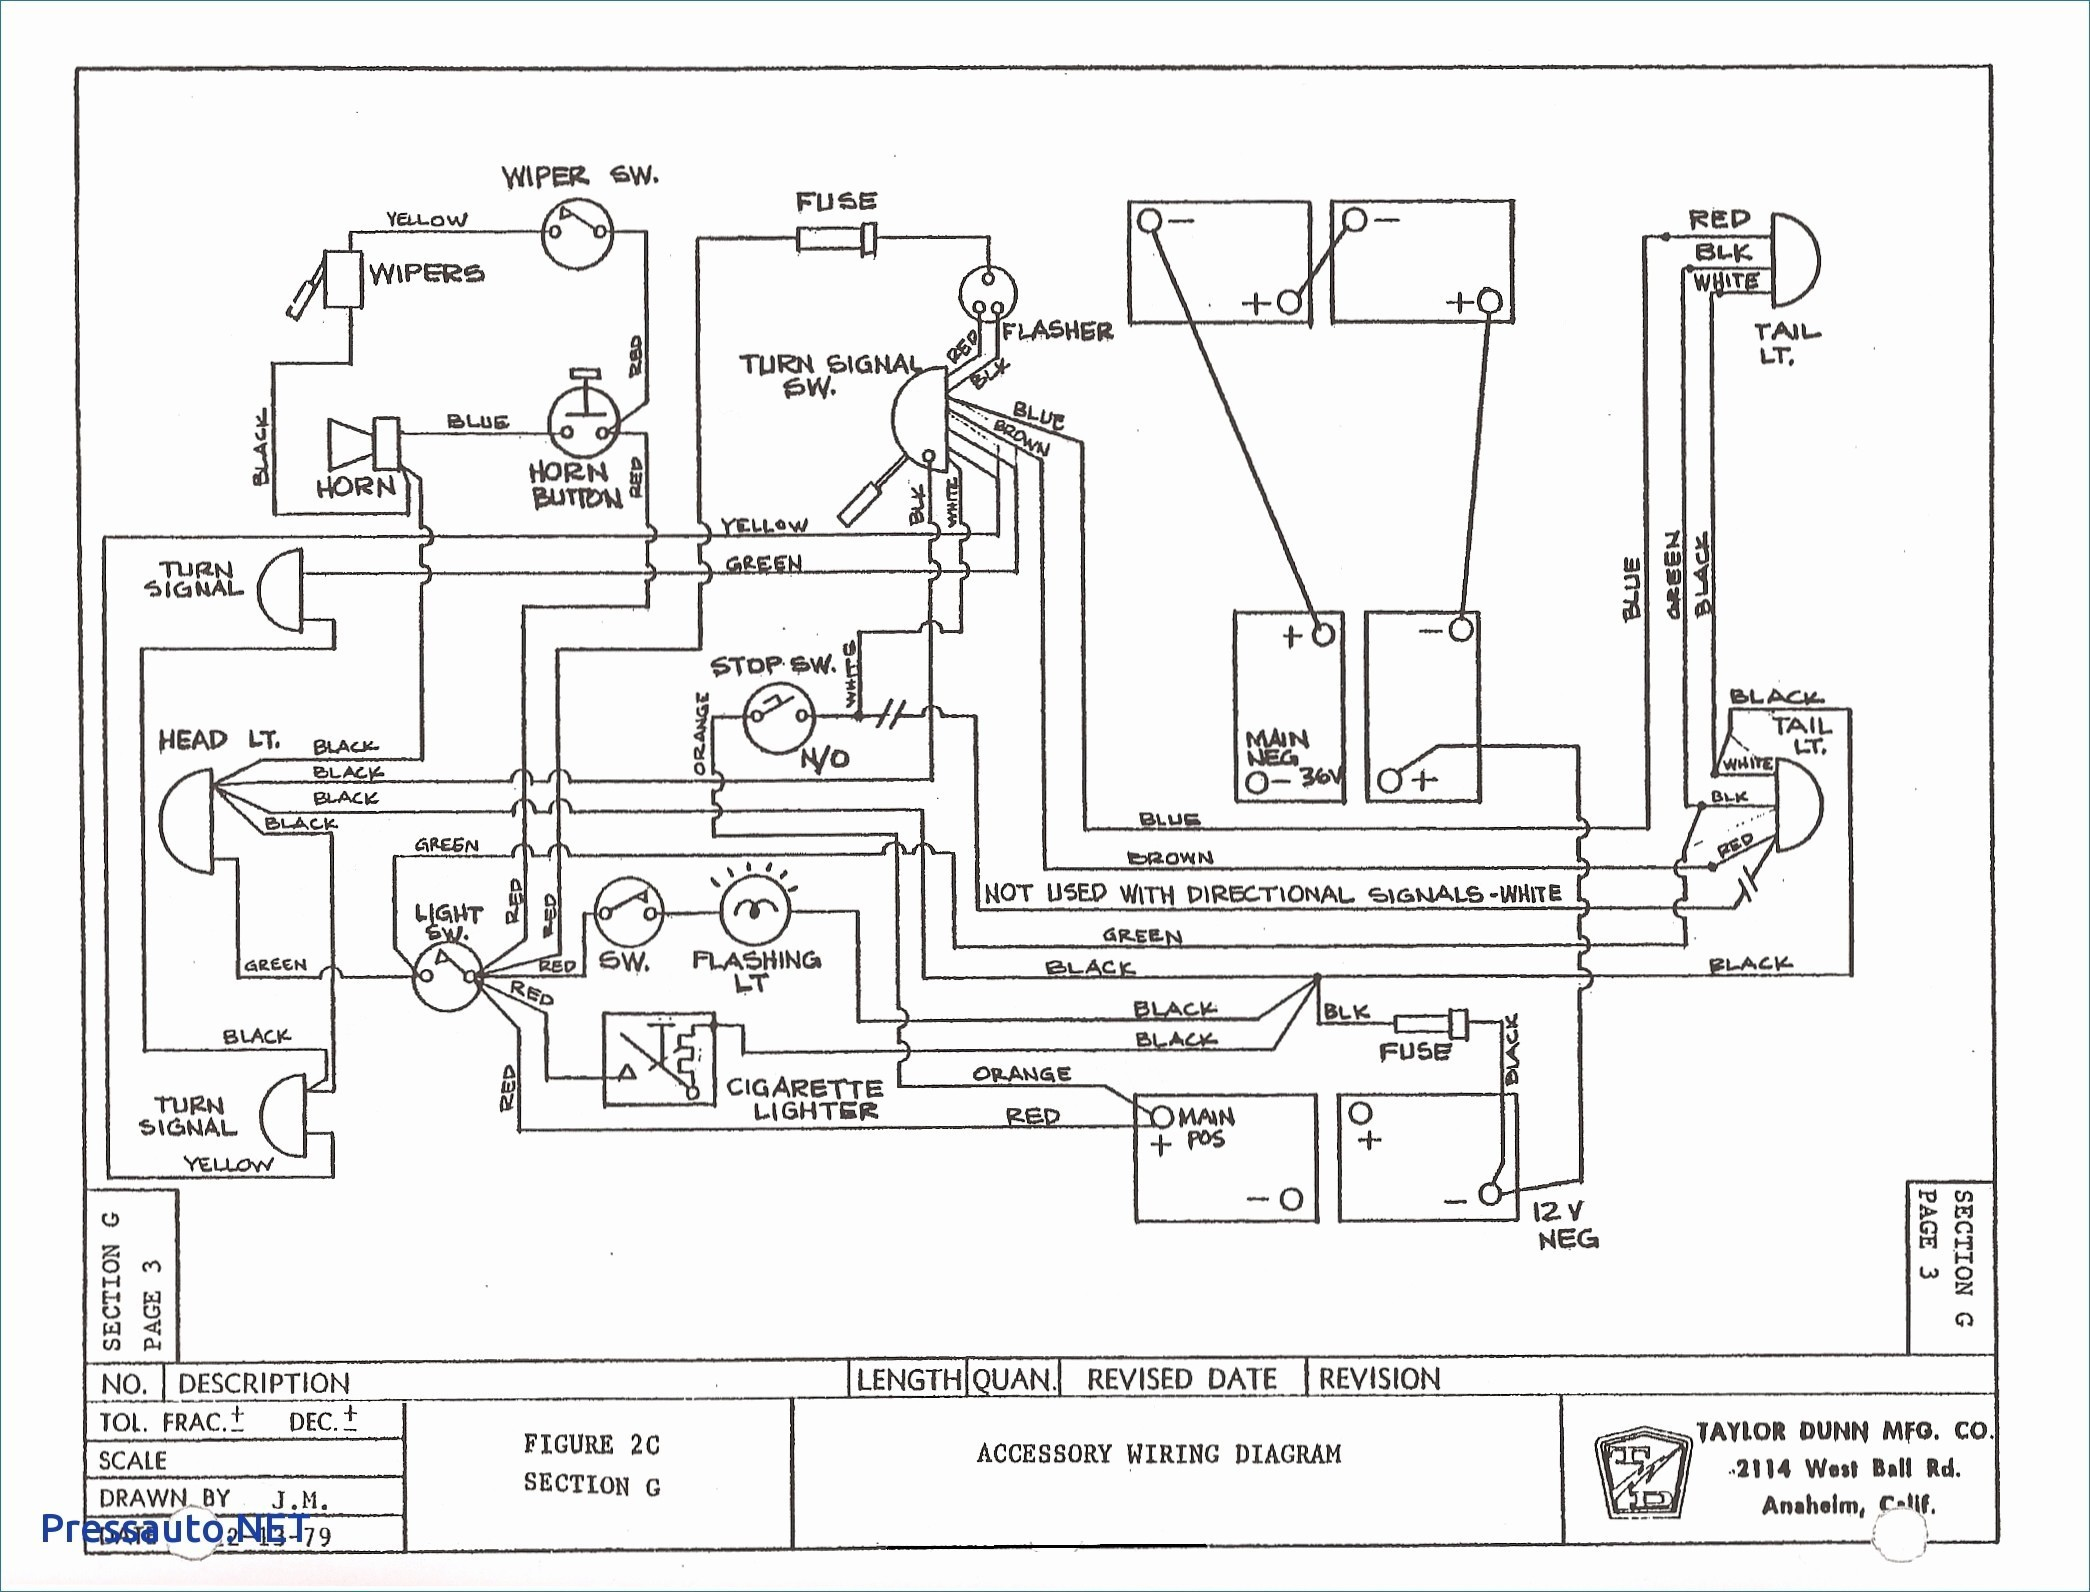 ezgo electric motor wiring diagram get free image about wiring 1996 ezgo golf cart wiring diagram cushman golf cart wiring diagram car tuning car tuning wire center u2022 rh botarena co